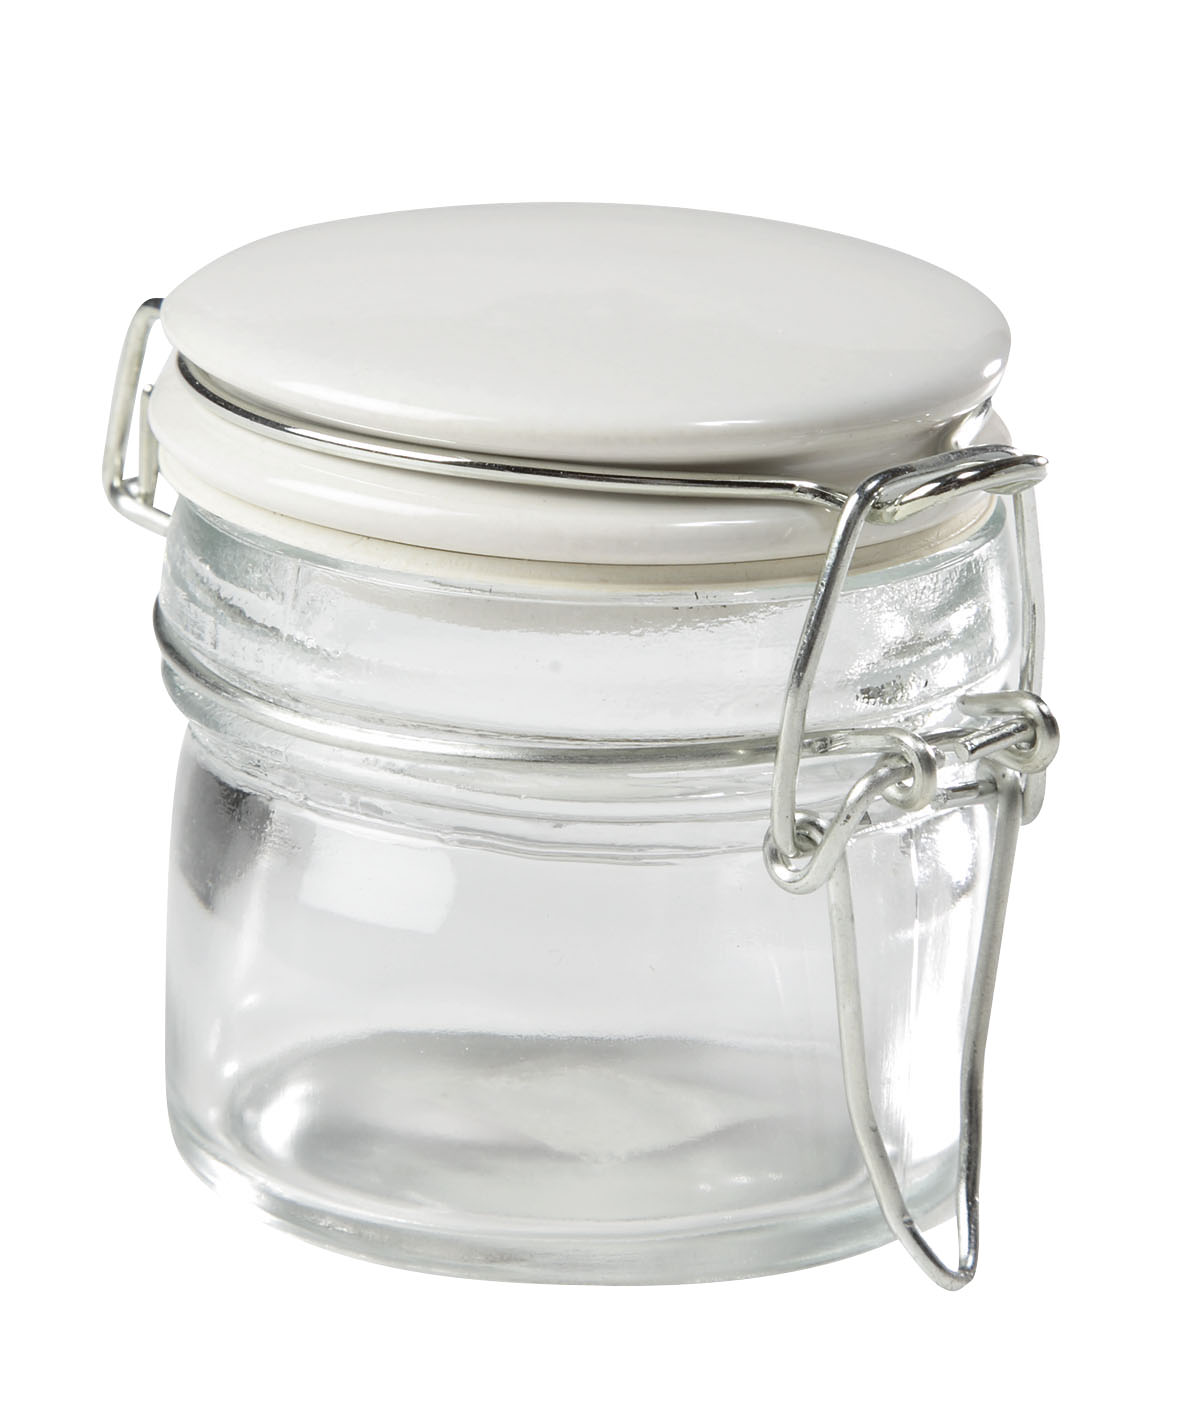 Strawbridge Storage Jar   €2.95  Product Code: Comp-1620